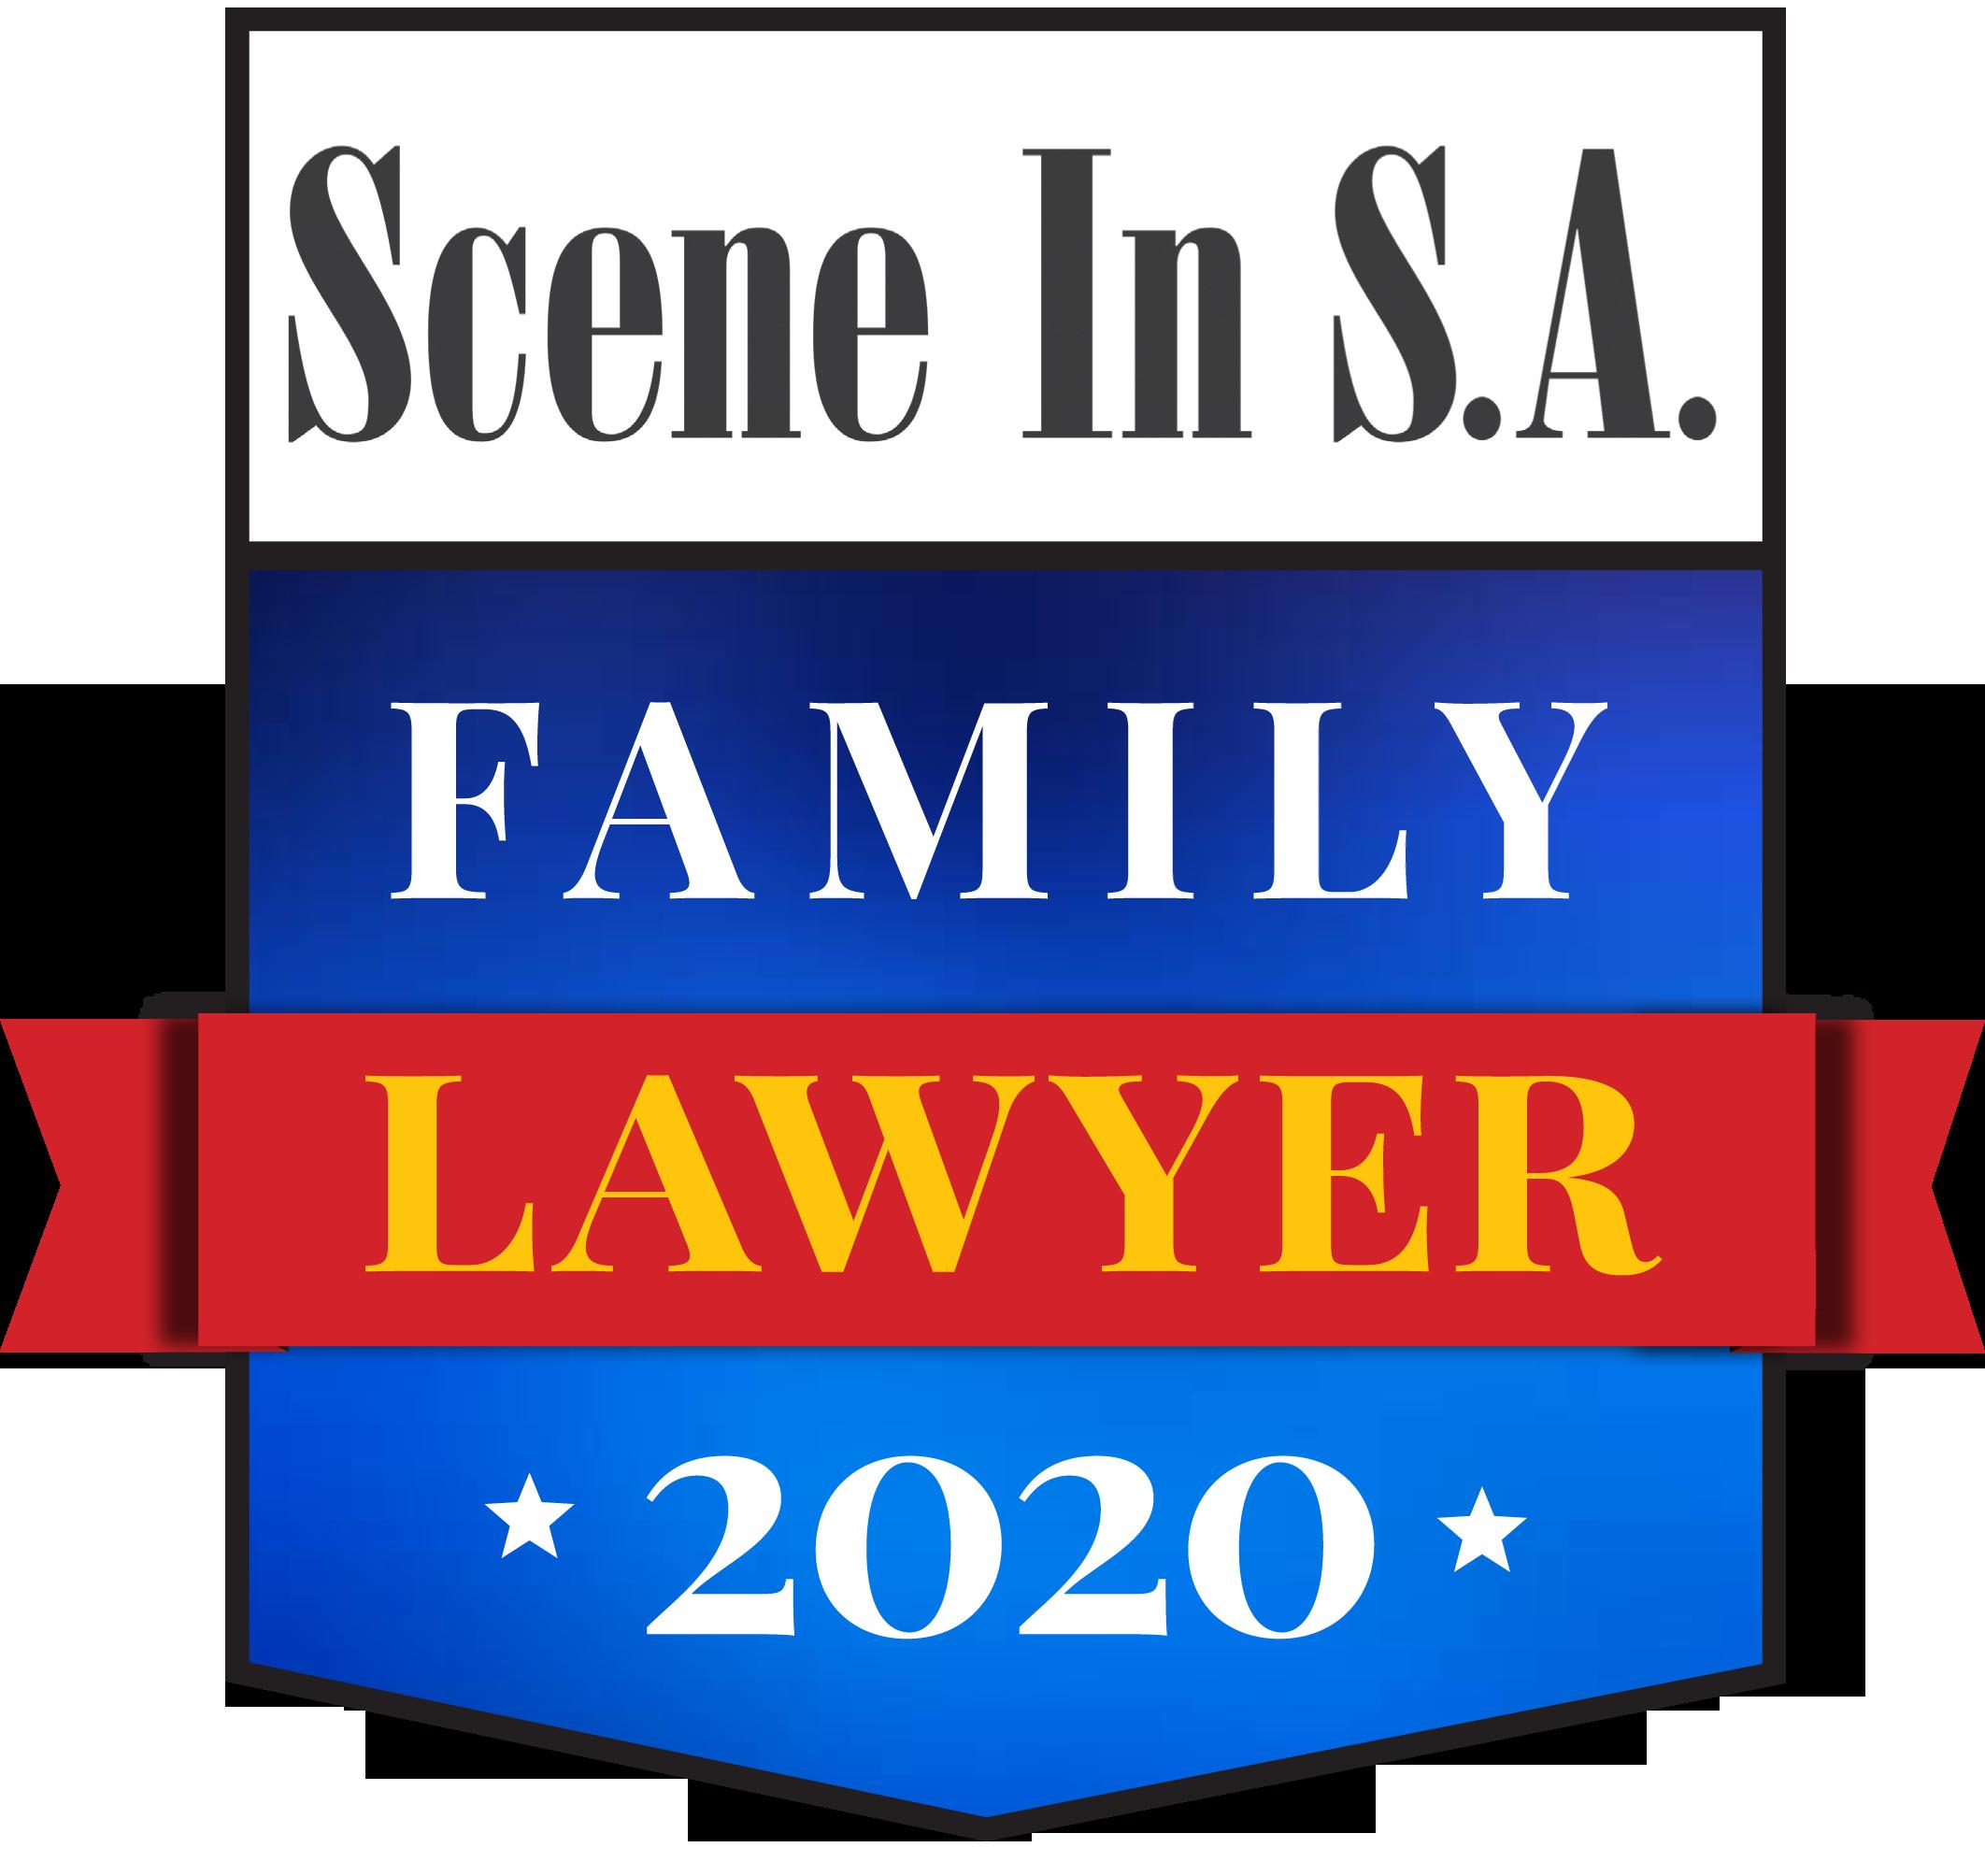 Family lawyer San Antonio